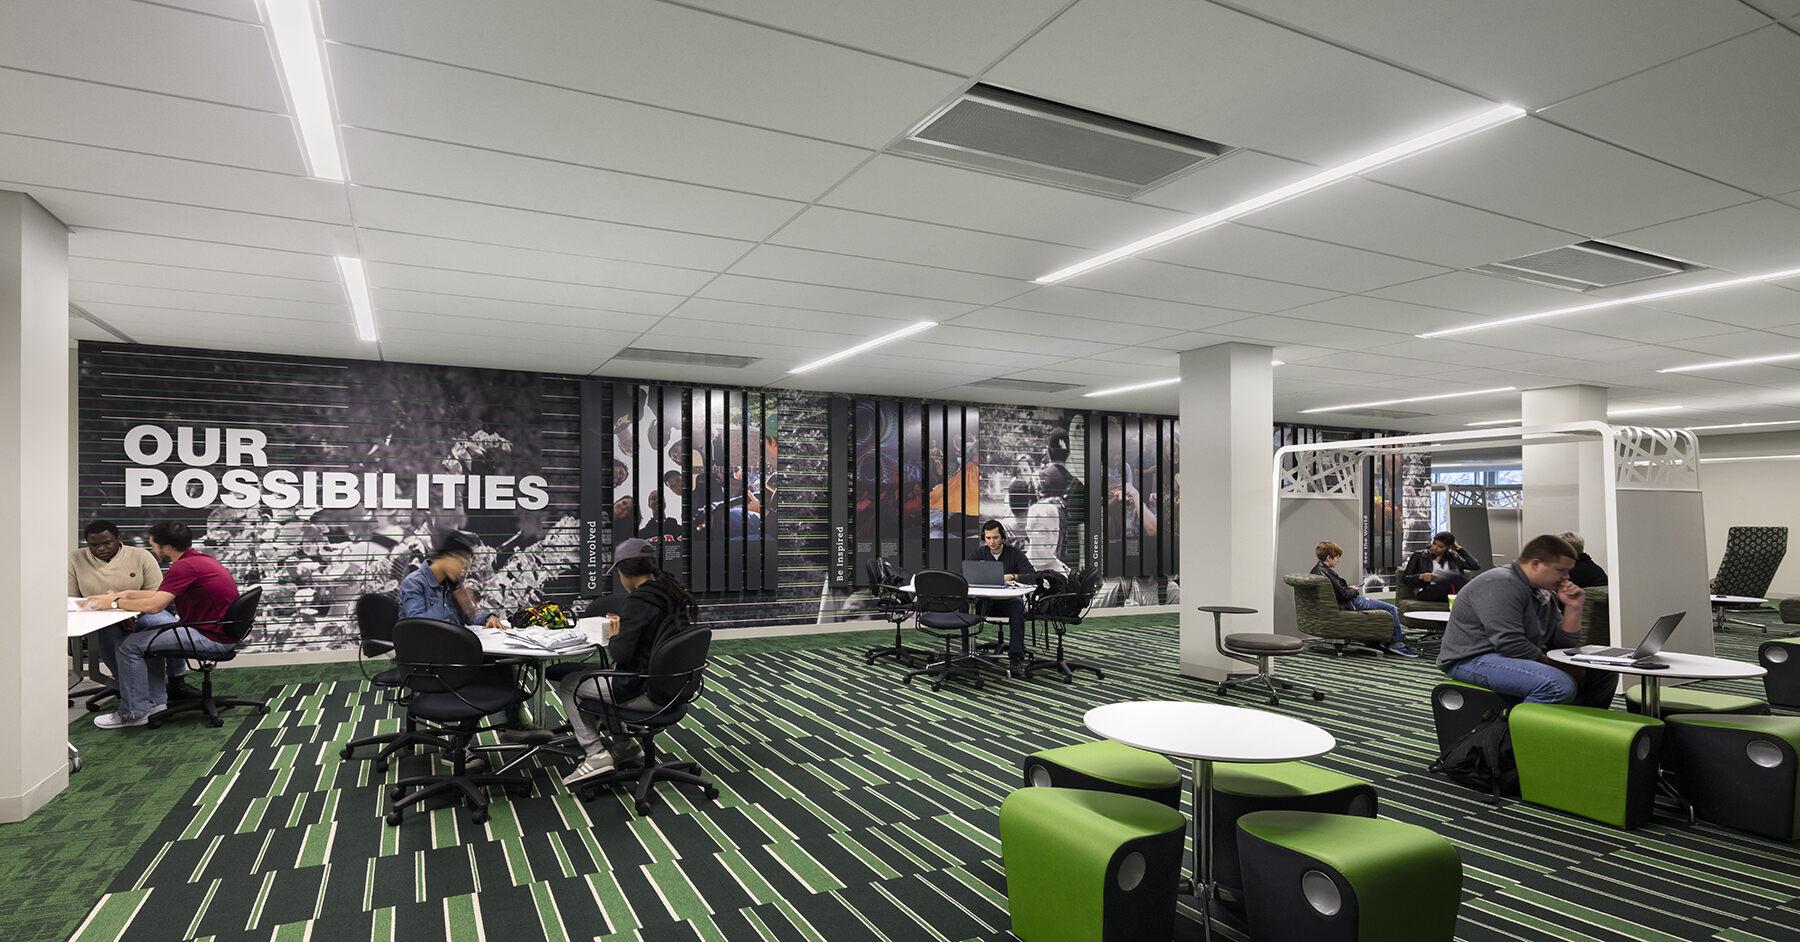 Interior Design For Students A View Into Their Future Building Design Construction,Emerald Green Dark Green Interior Design